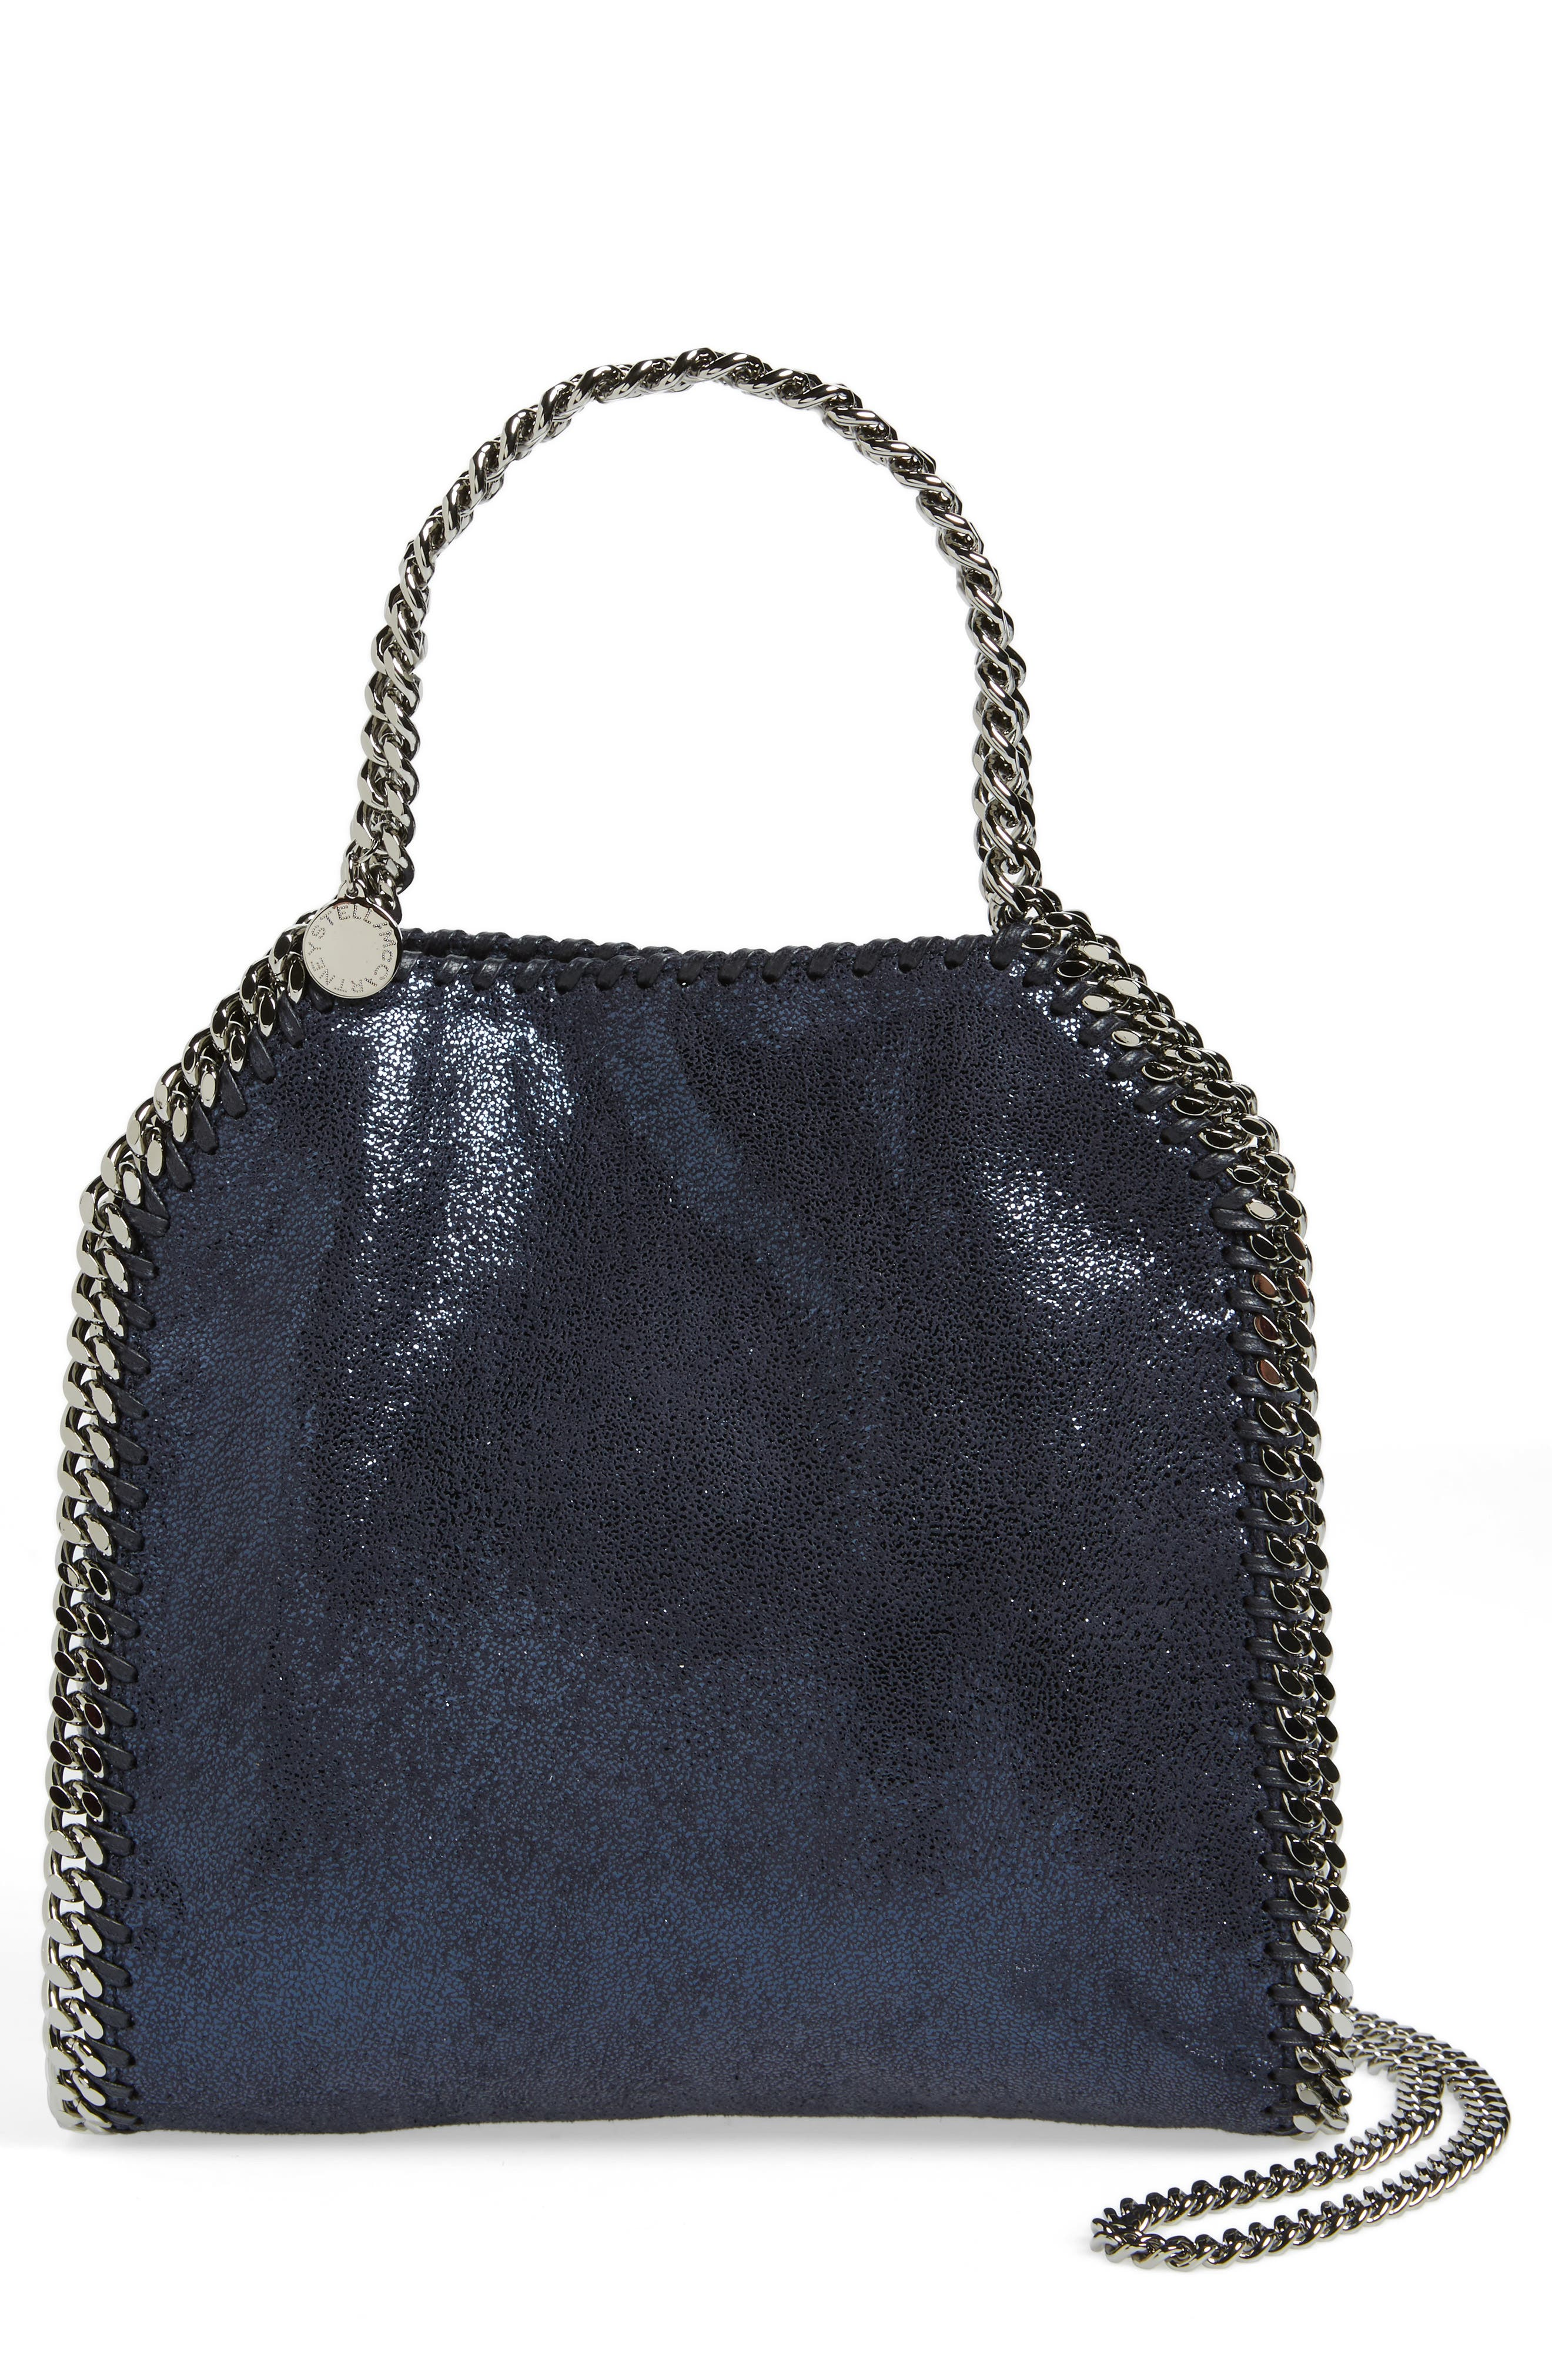 Stella McCartney 'Mini Falabella' Faux Leather Crossbody Bag